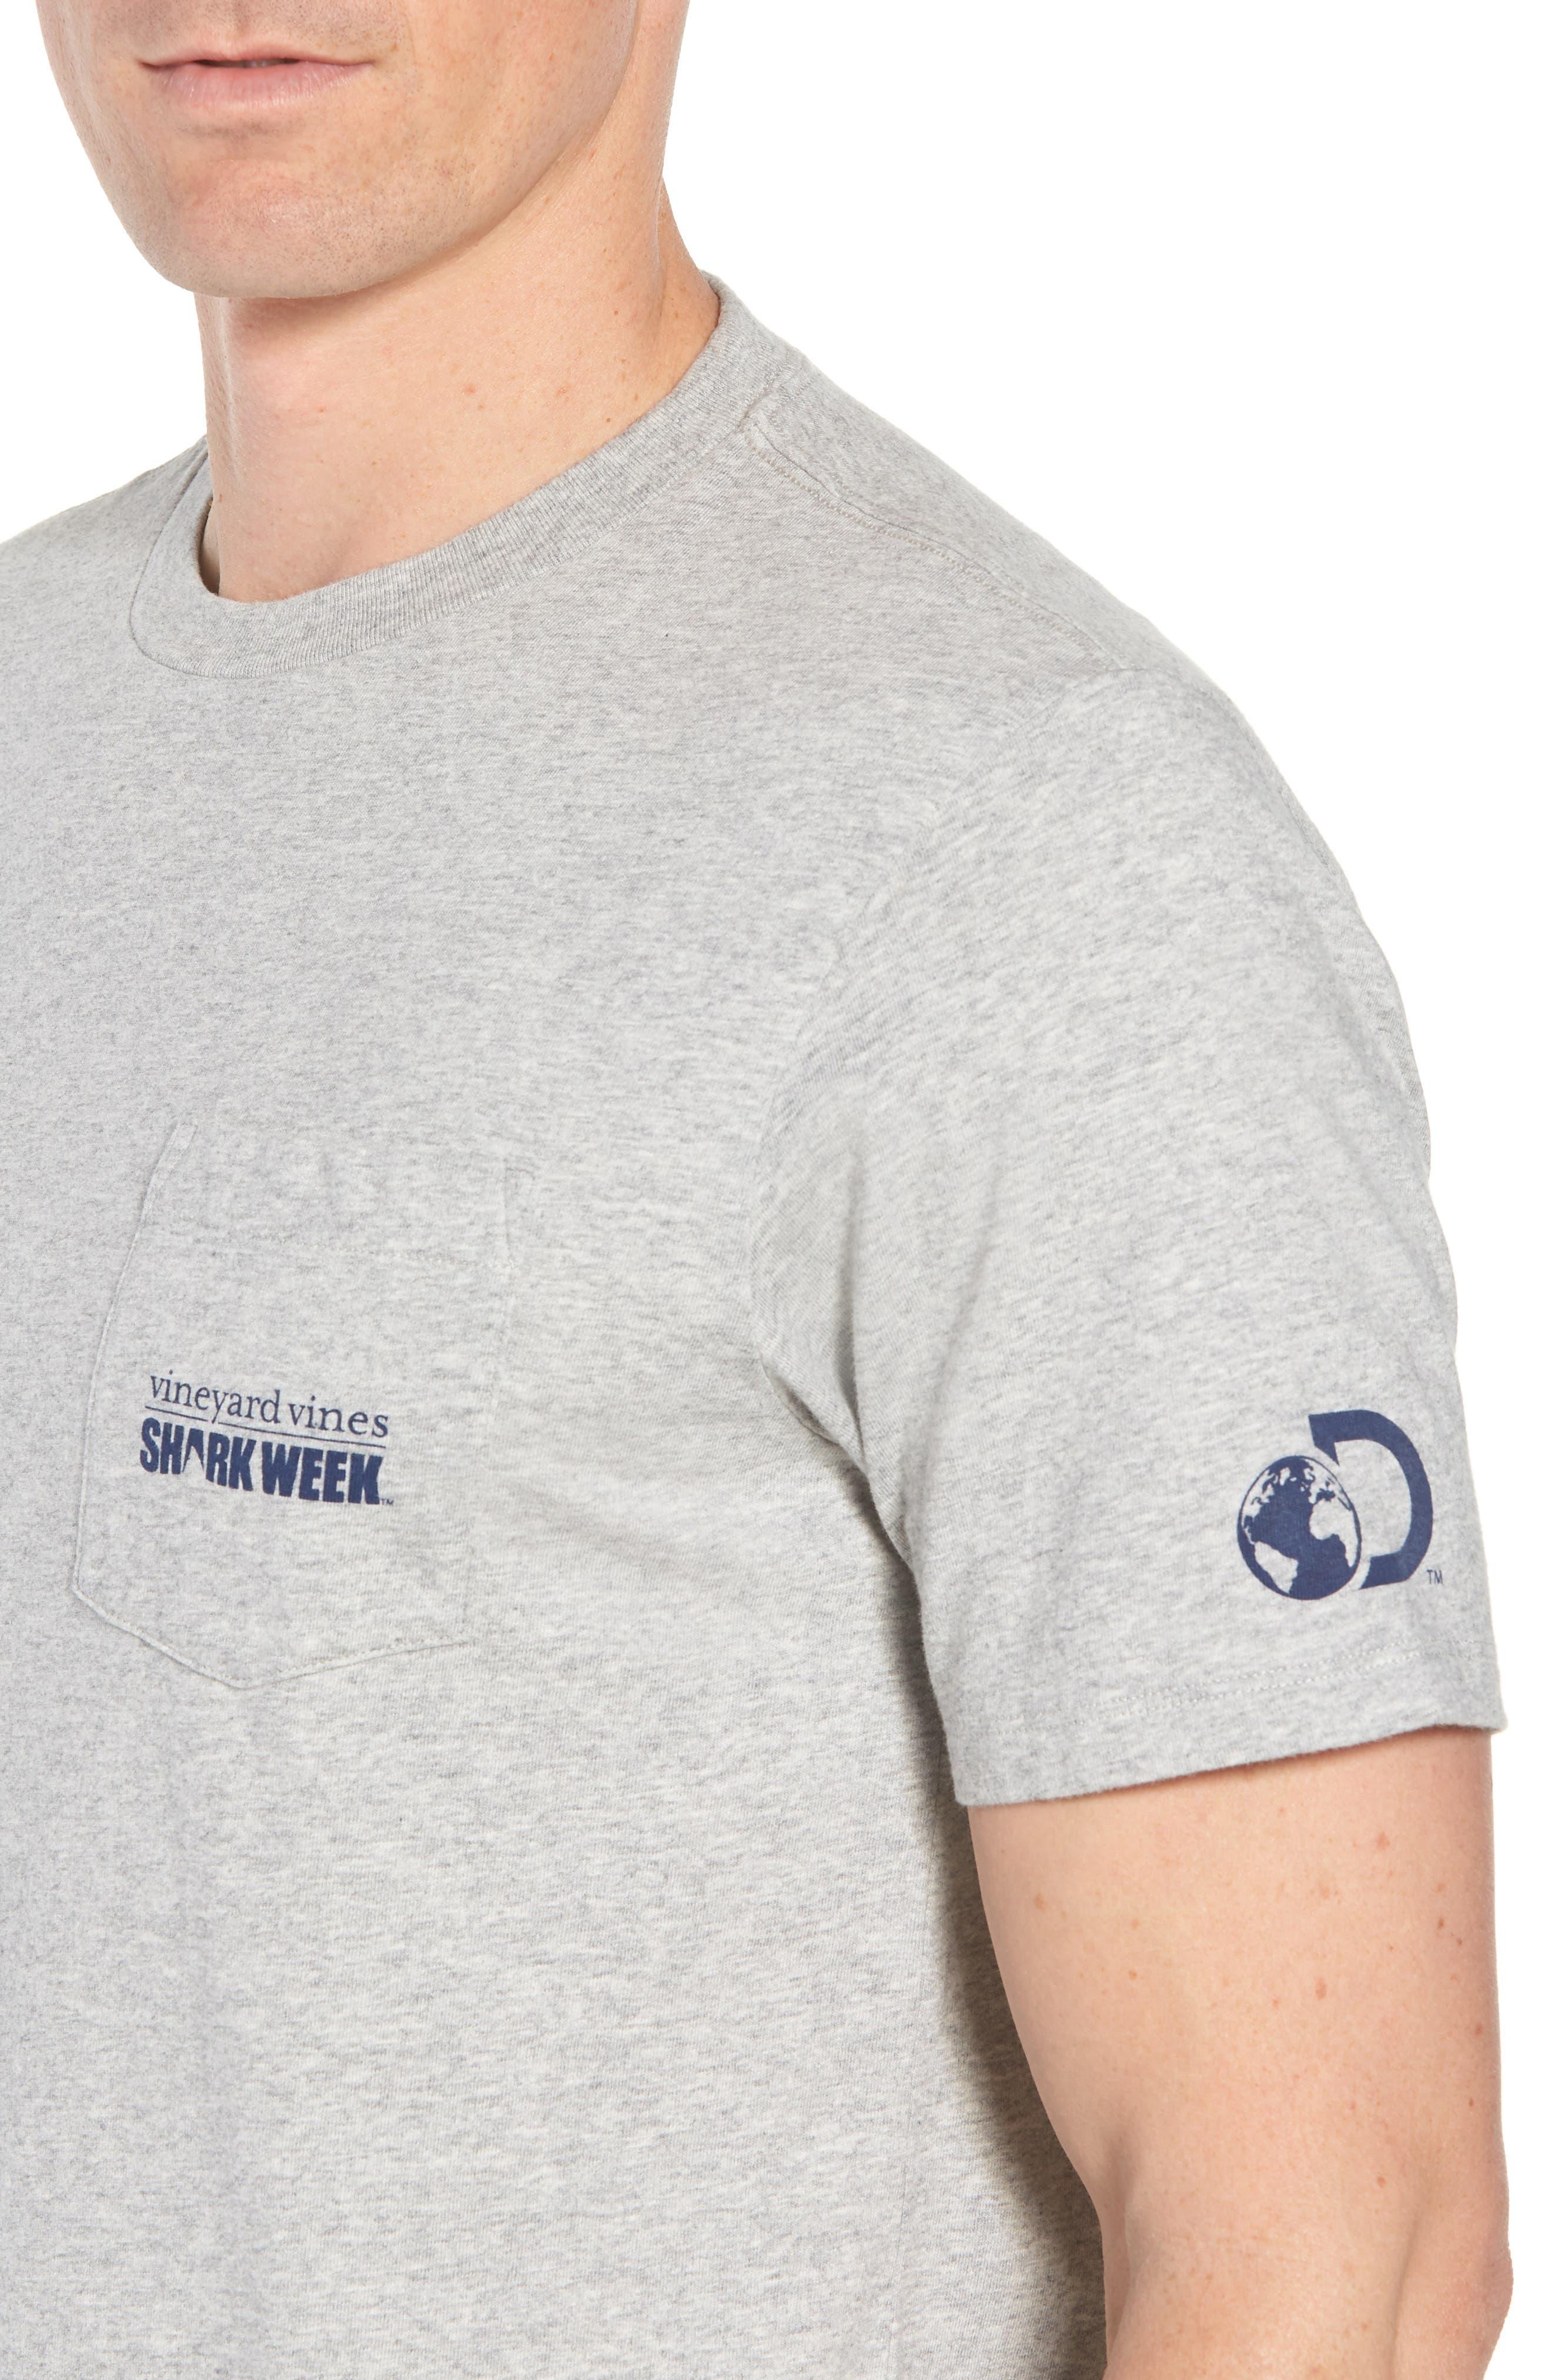 x Shark Week<sup>™</sup> Sharks & Stripes Pocket T-Shirt,                             Alternate thumbnail 3, color,                             Grey Heather